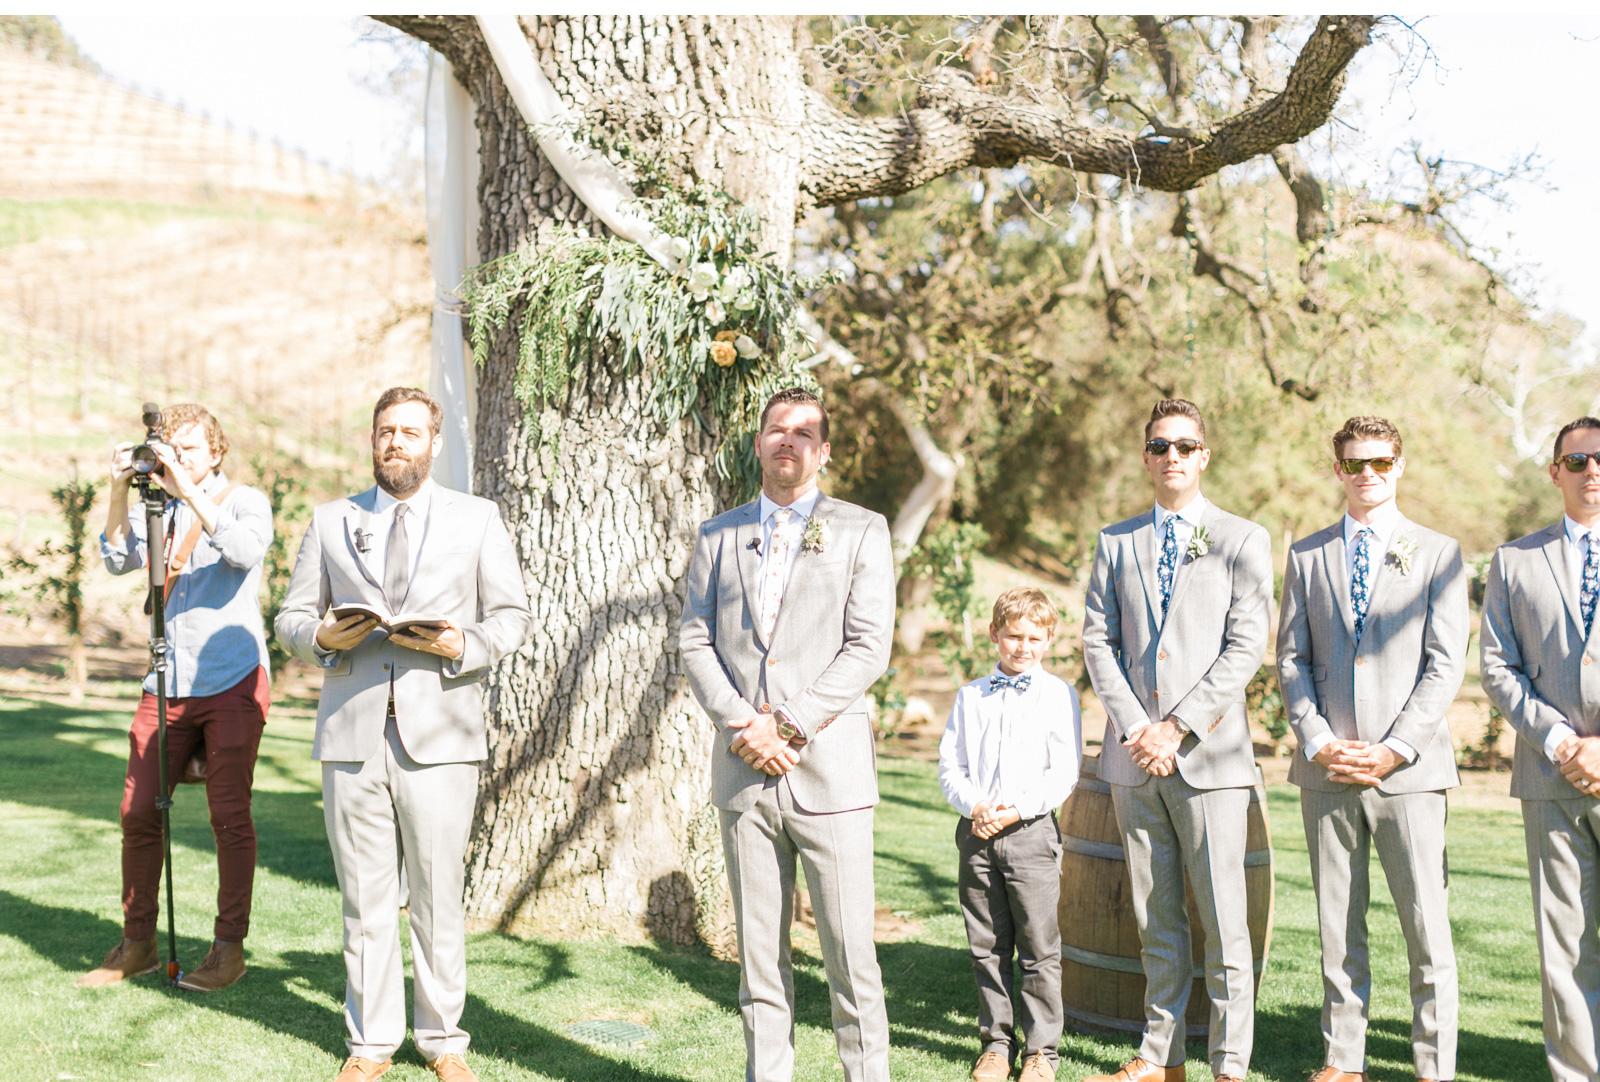 Malibu-Wedding-Photographer-Triunfo-Creek-Natalie-Schutt-Photography_16.jpg